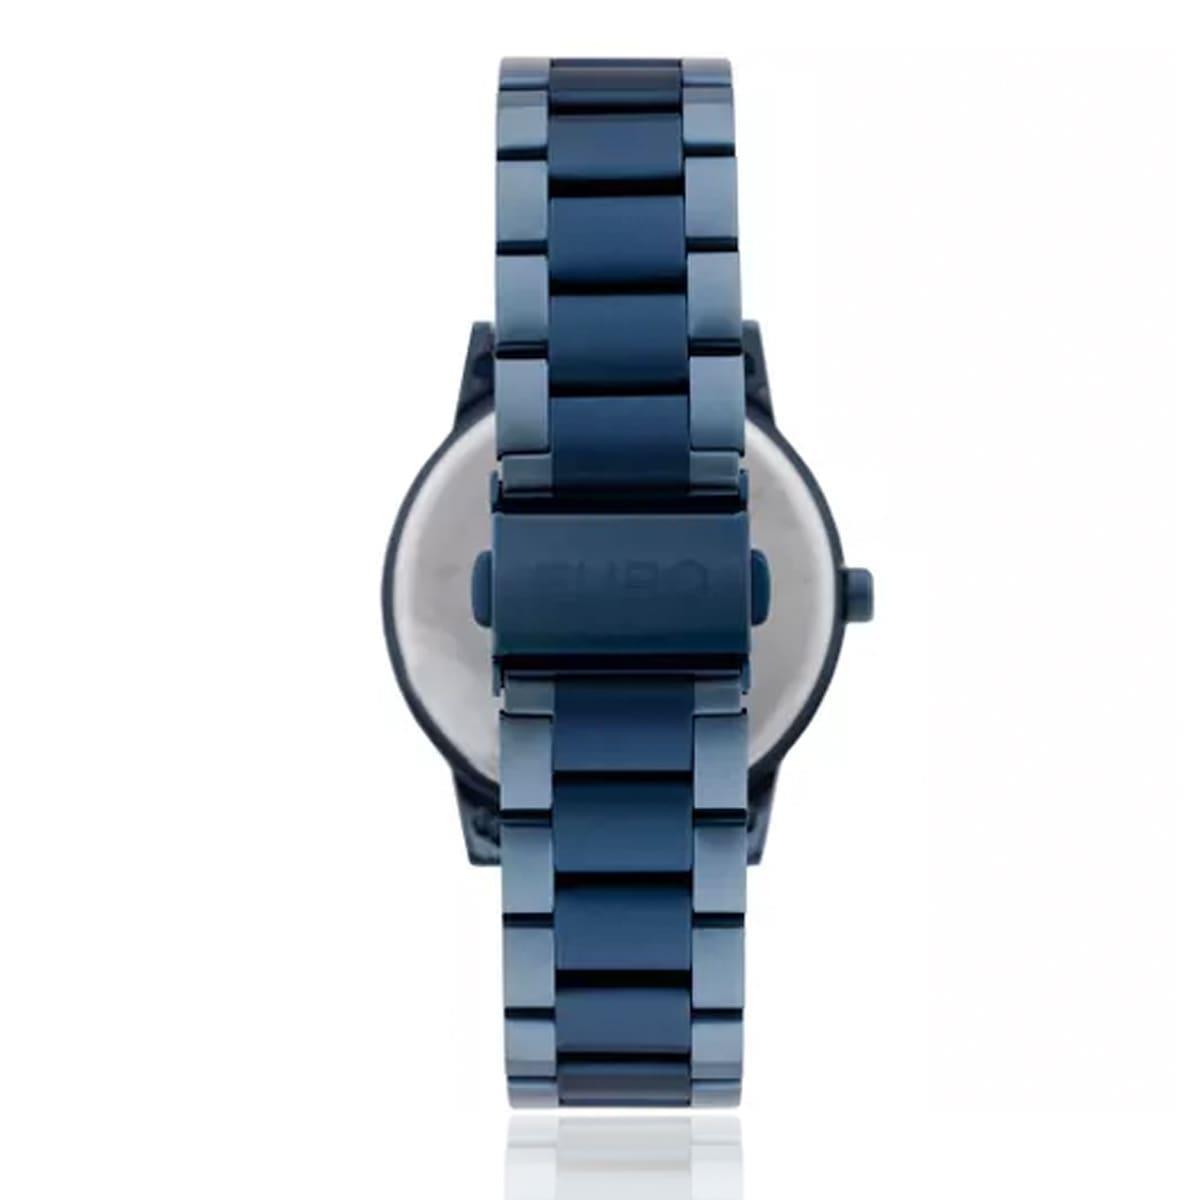 00f9b5fbeb7 Relógio Feminino Euro Metal Colors Analógico EU2036YLI 4A Azul